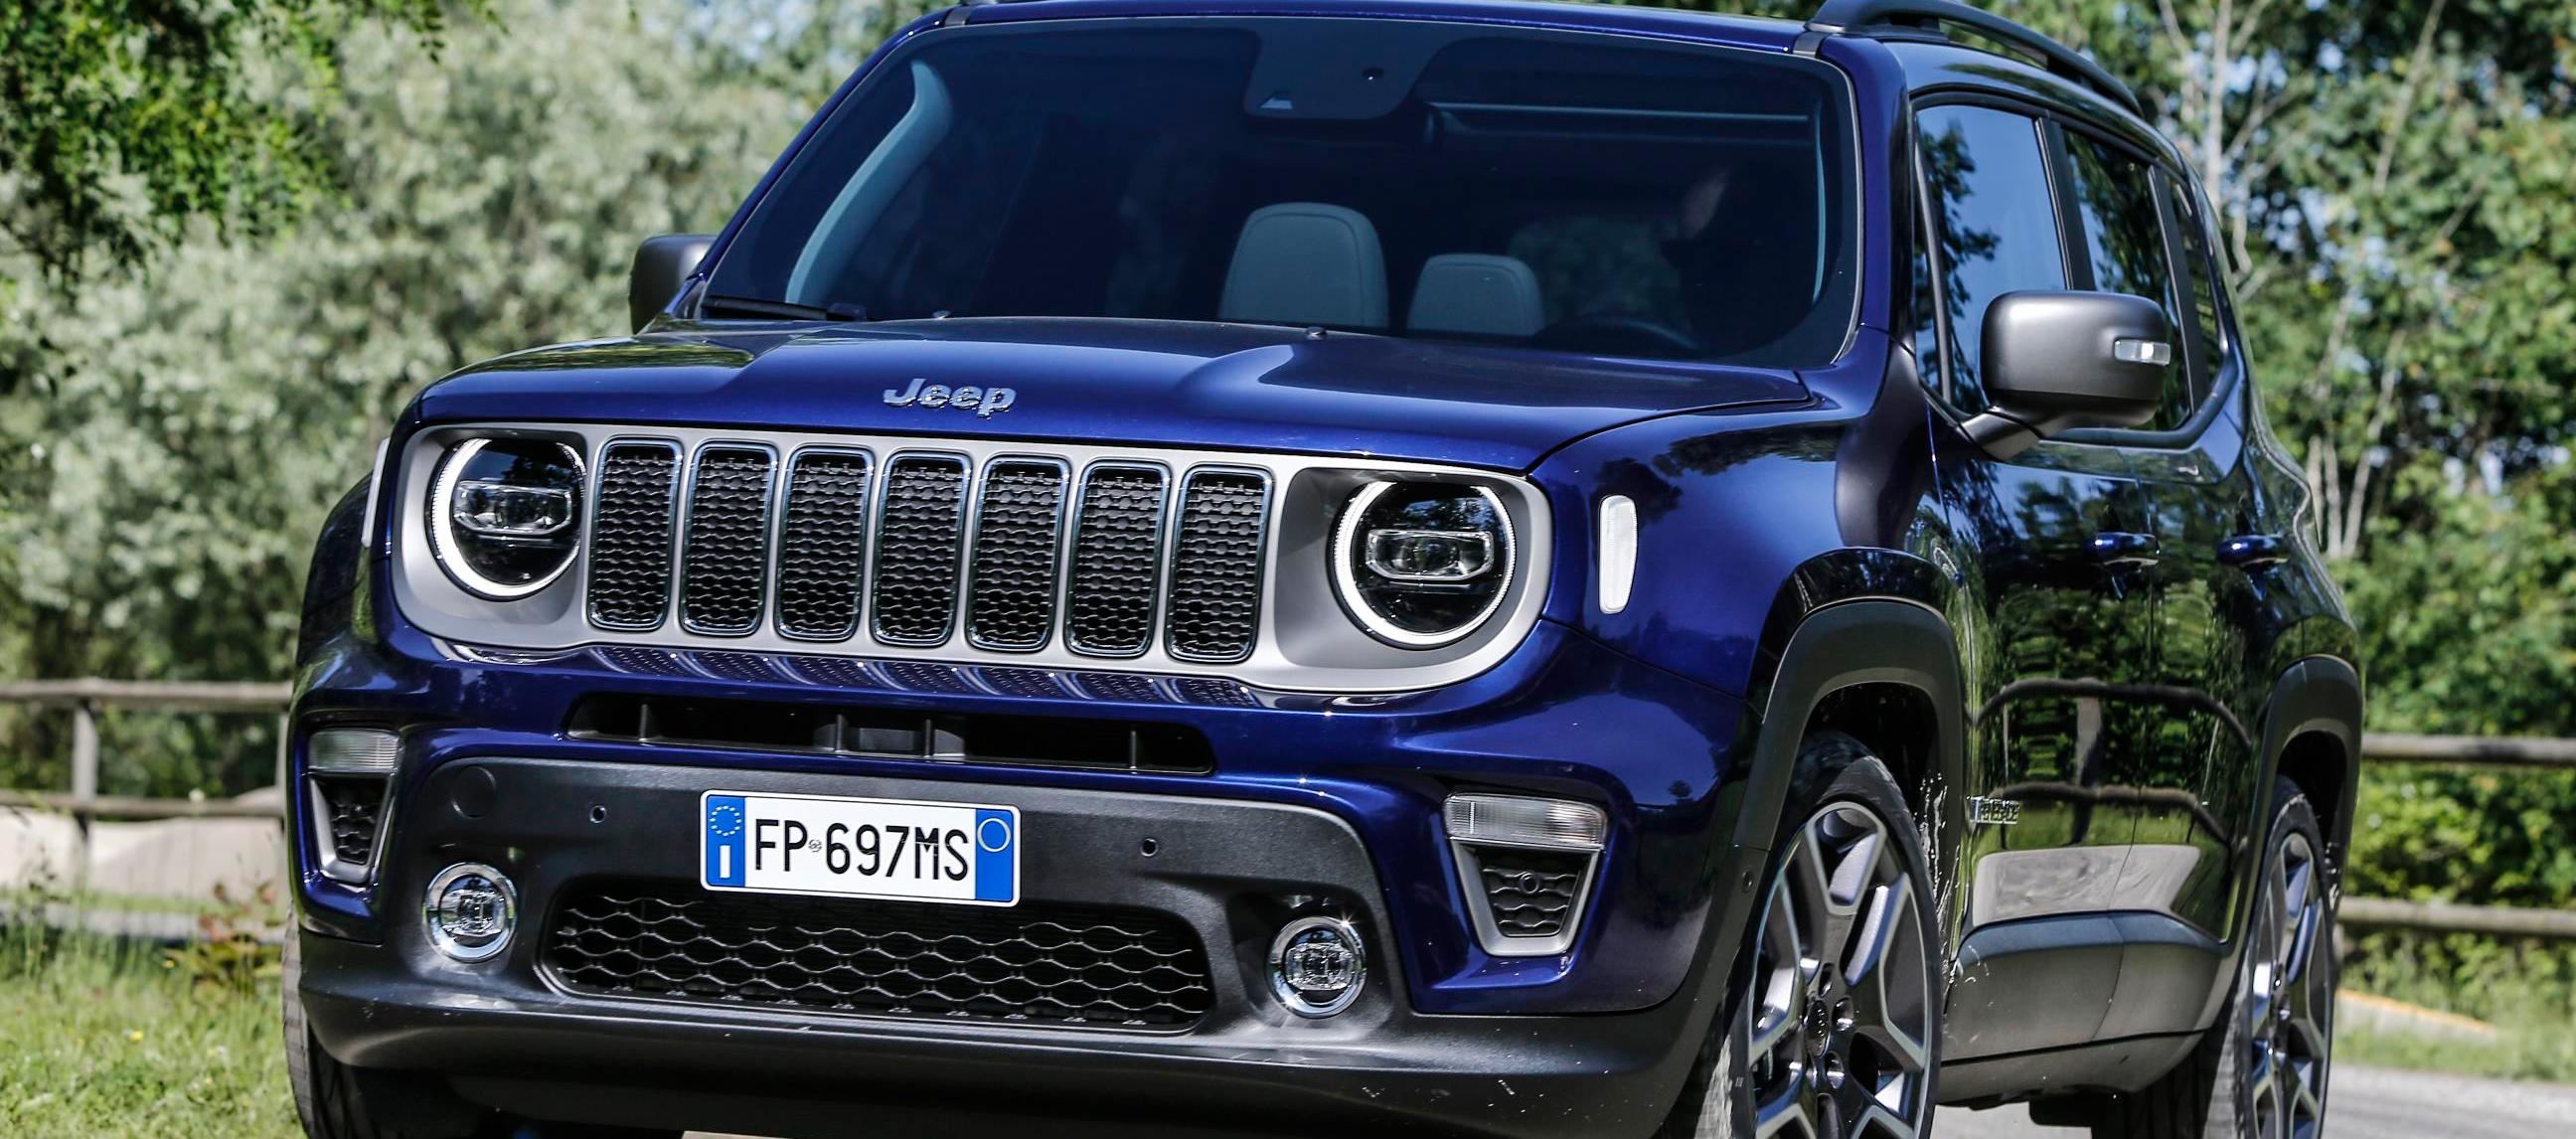 AUTO88 convierte Jeep a híbridos GLP